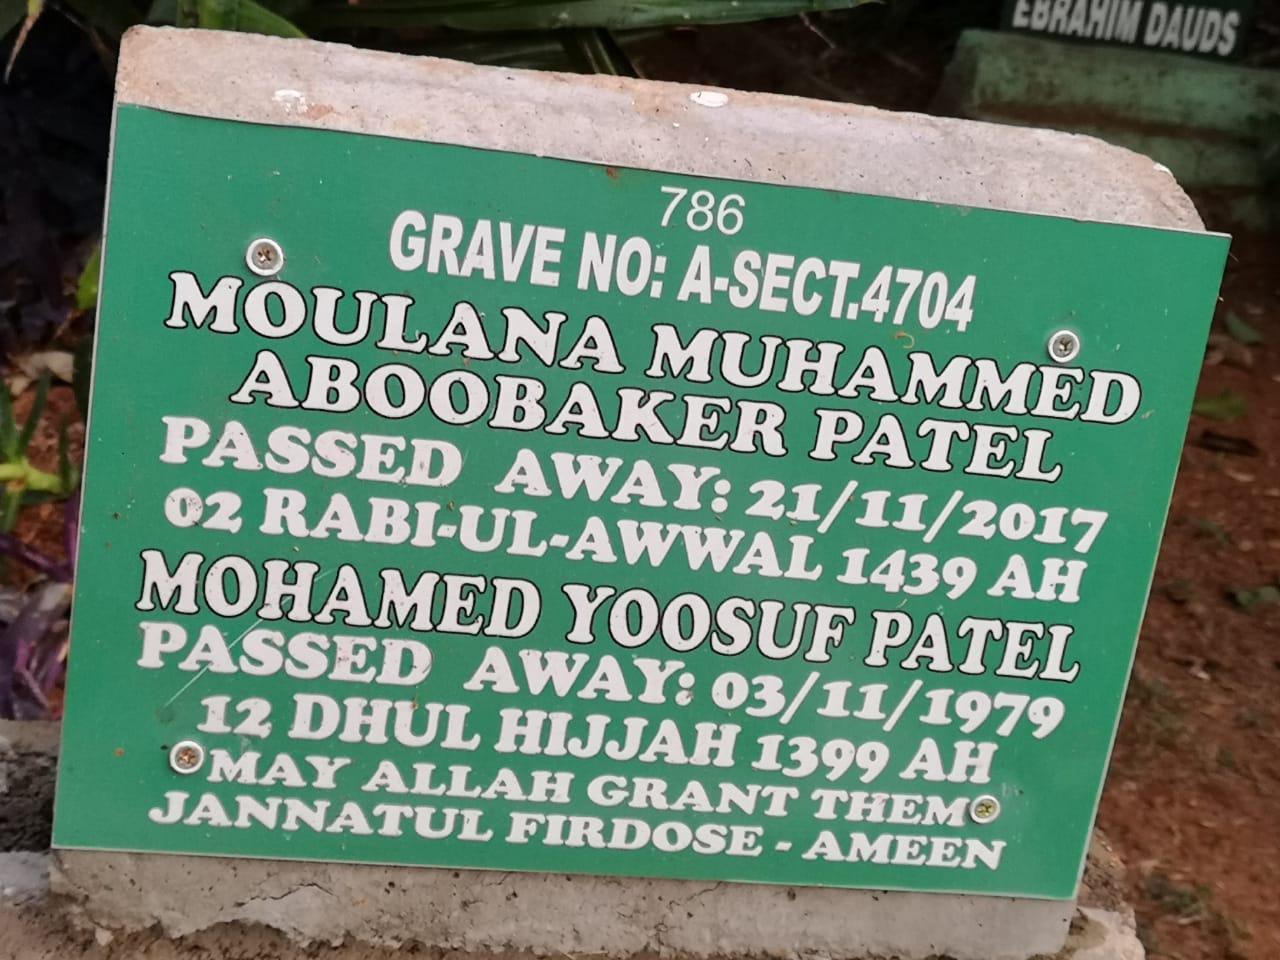 Moulana Muhammad Aboobakar Patel November 21, 2017